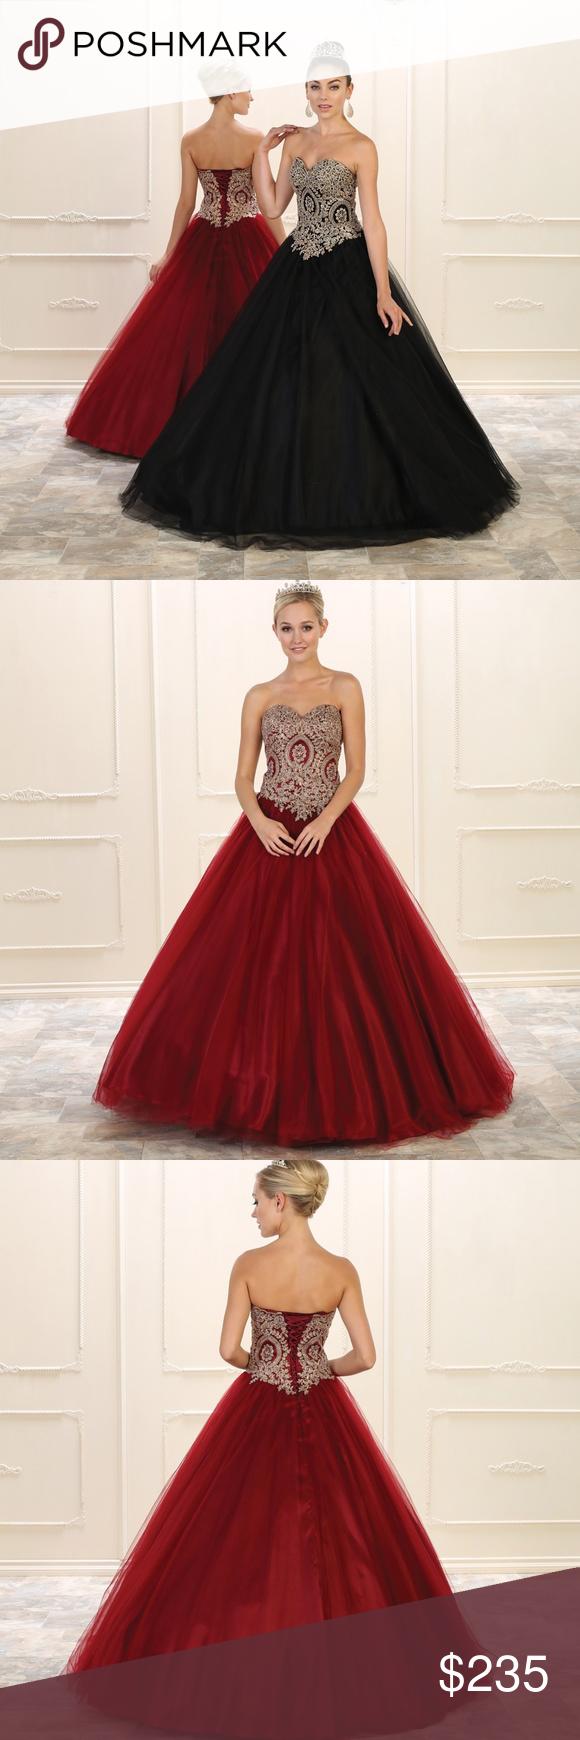 may queen lk prom long dress new evening boutique pinterest